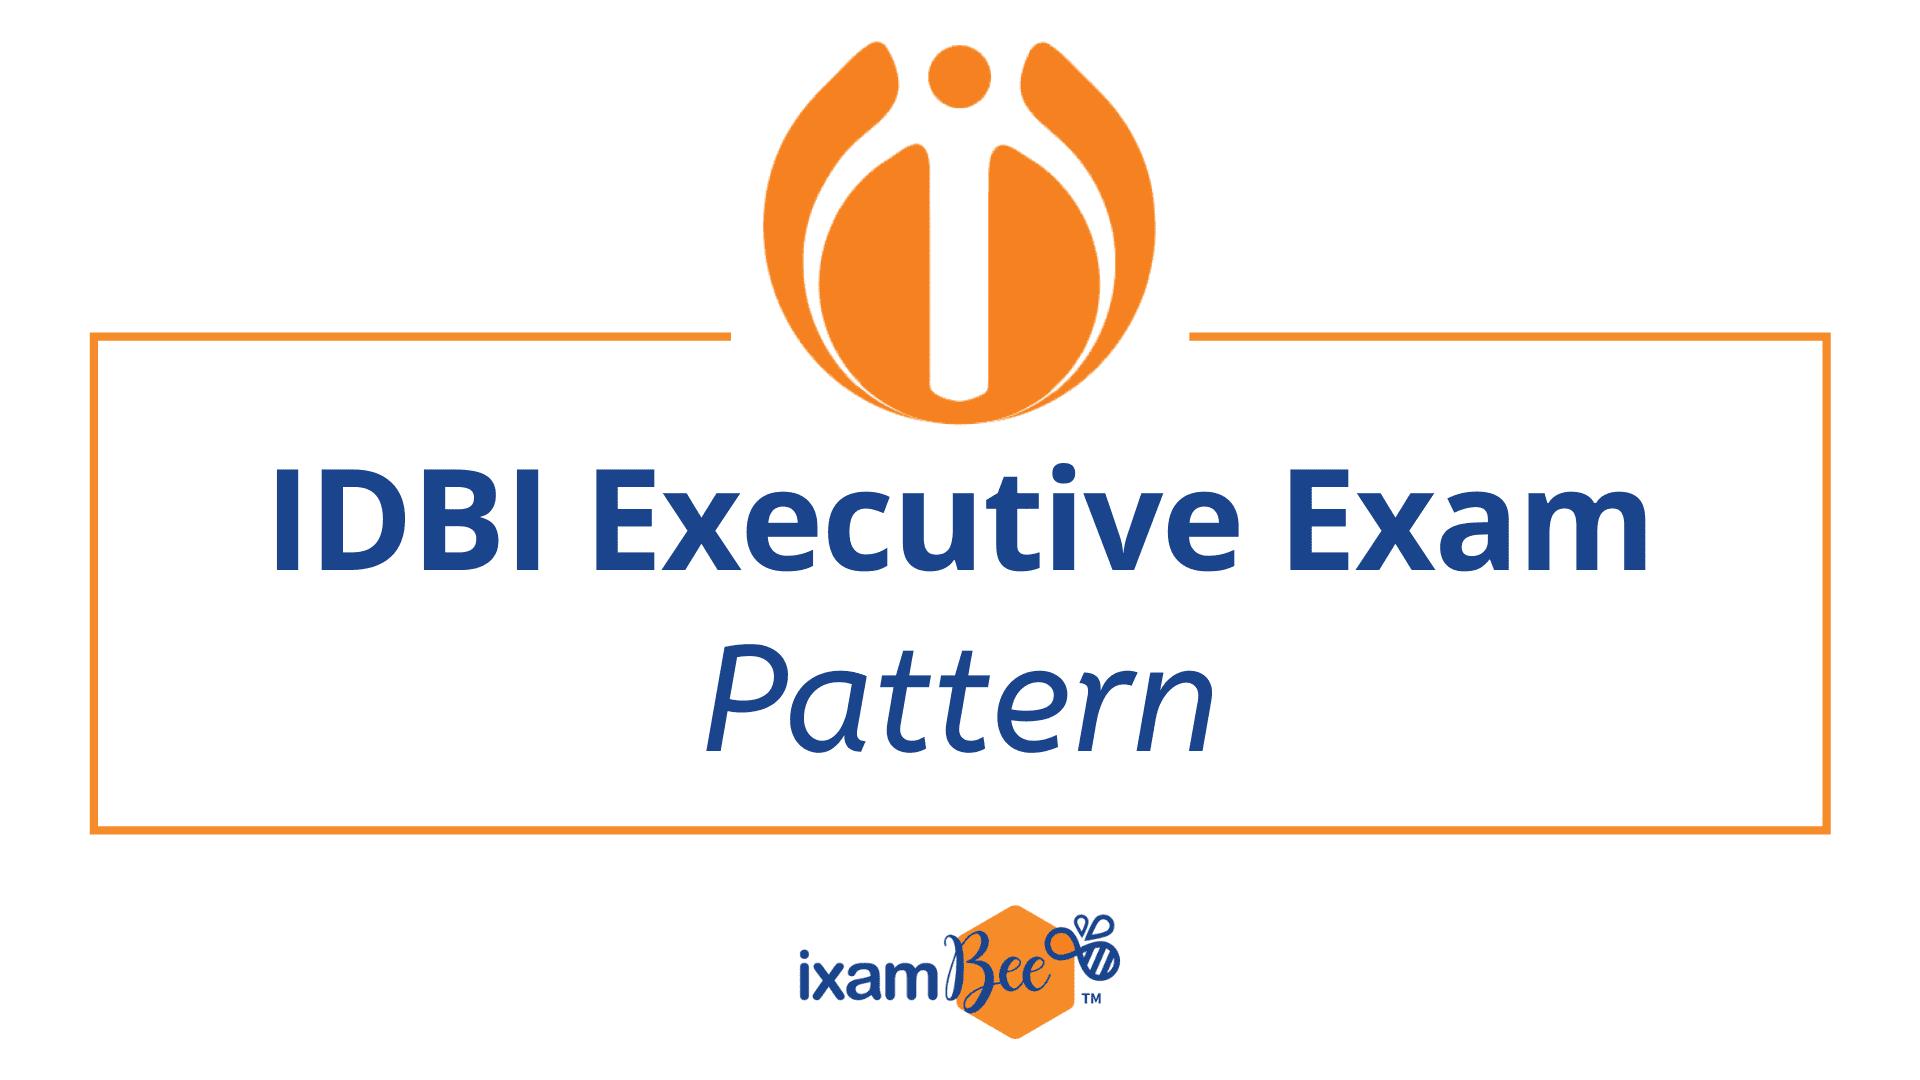 IDBI Executive Exam Pattern